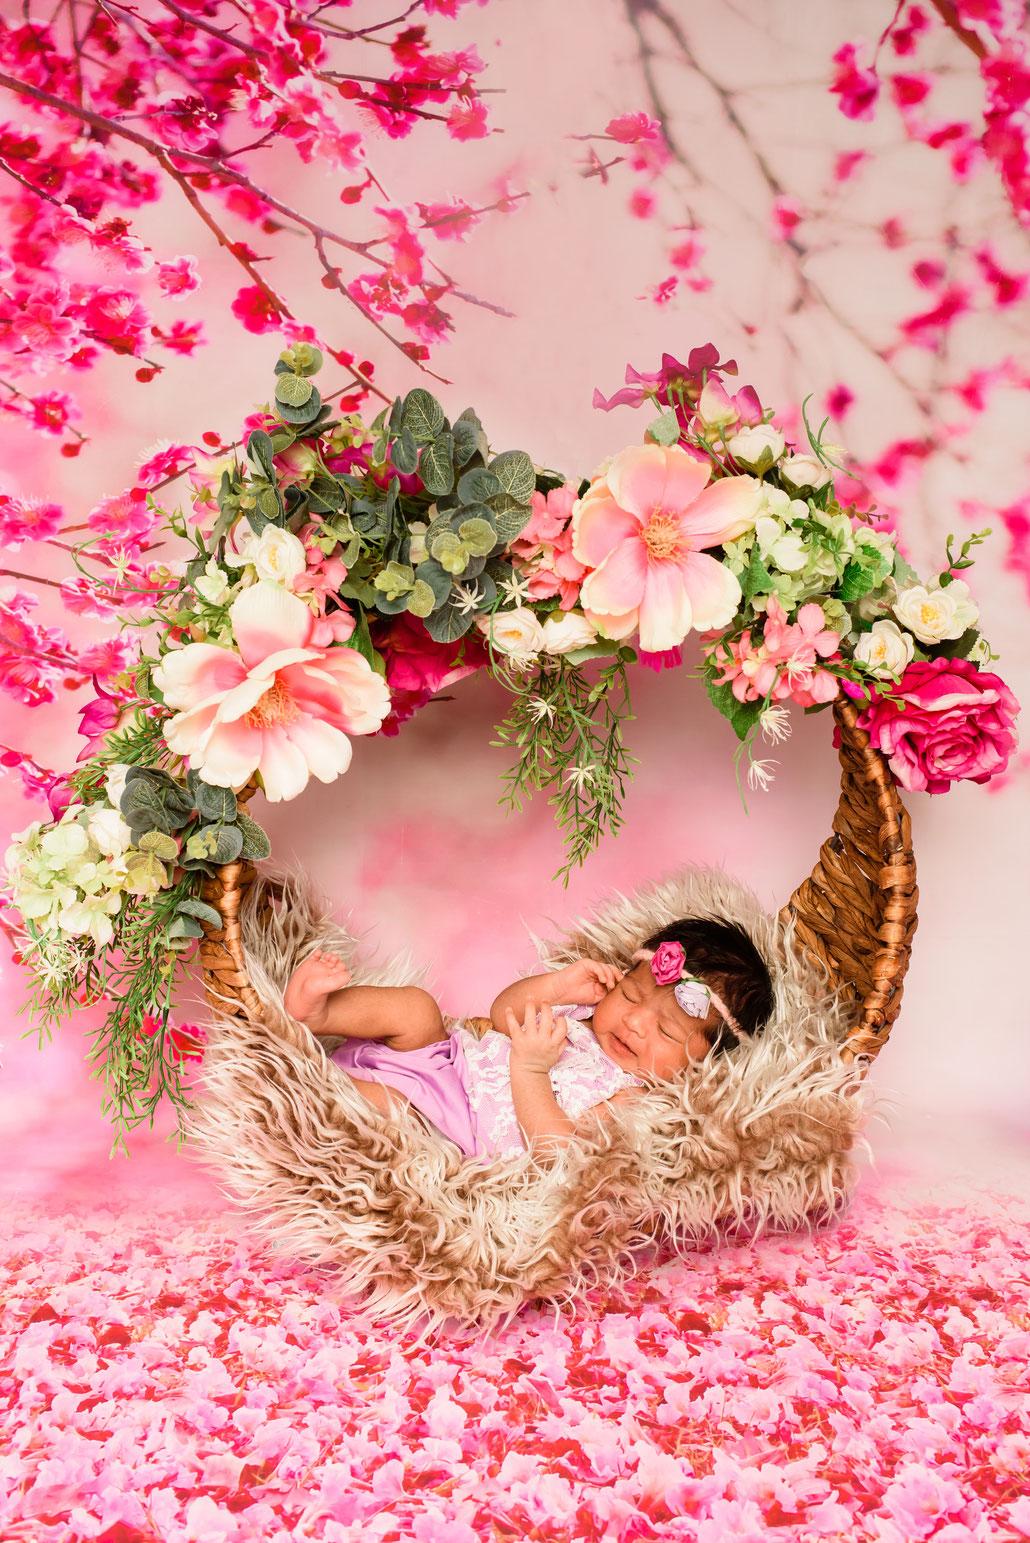 baby sleeps in cradle